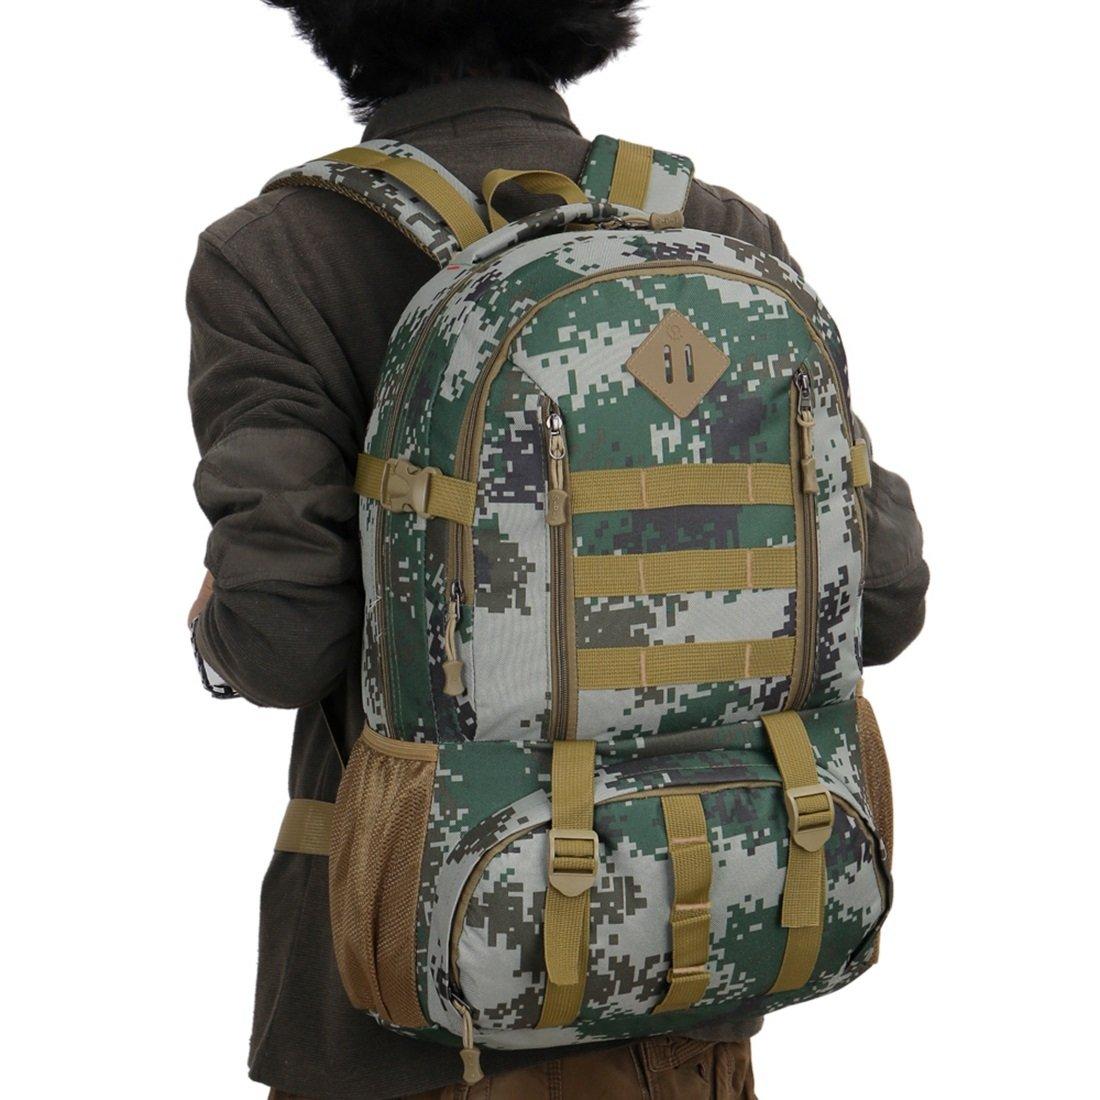 Carriemeow アウトドア登山バッグ 旅行バックパック 男女兼用 大容量50L 迷彩ショルダーバッグ トラベルバッグ オックスフォード生地 Carriemeow B07PKFB36D Army Green Camo